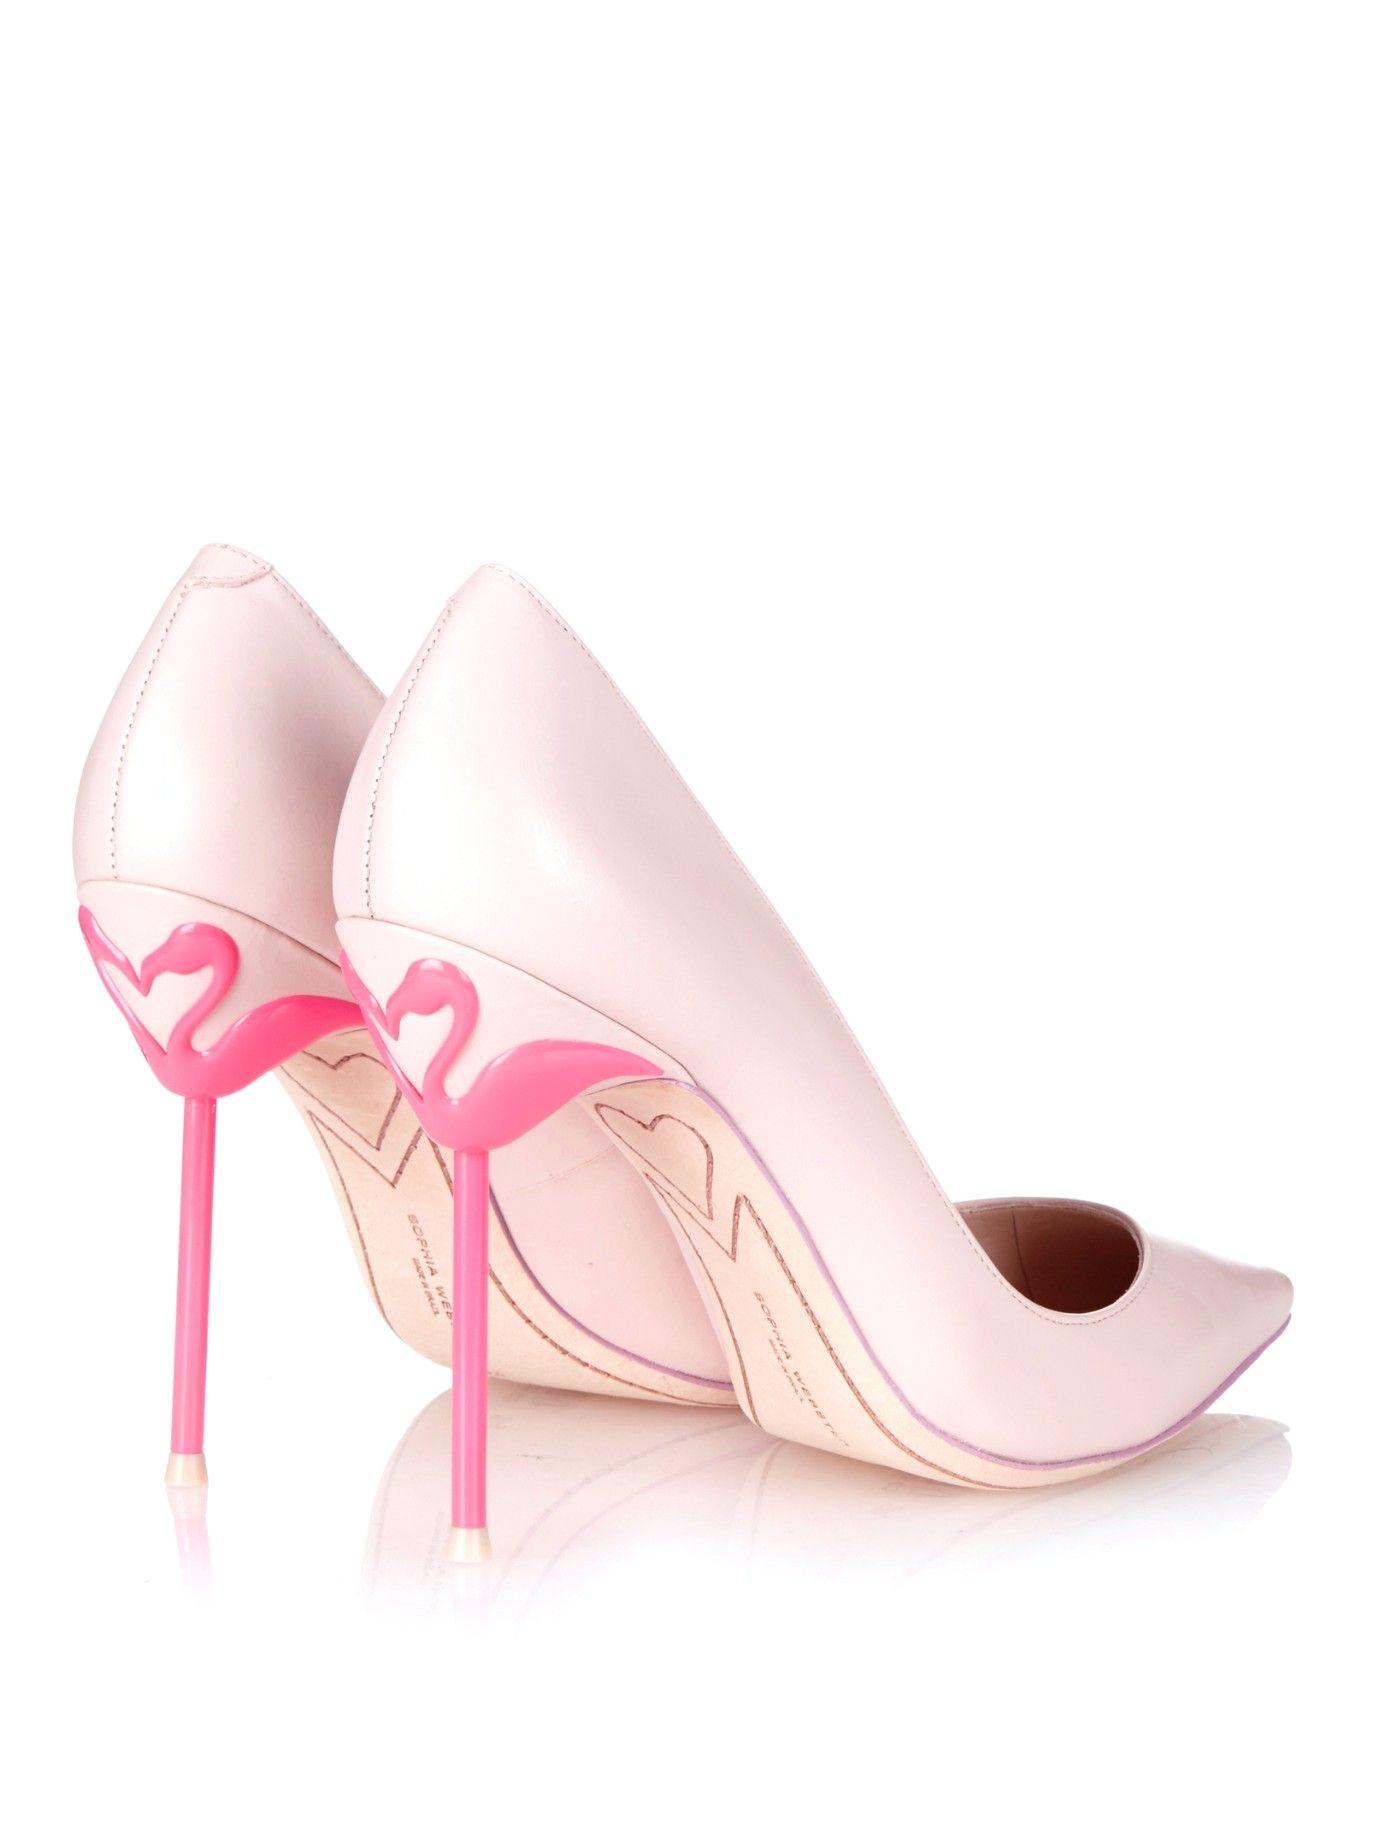 Light Pink Suede Pumps Flamingo Pumps sophia Webster Coco Flamingo Heel Leather Pumps